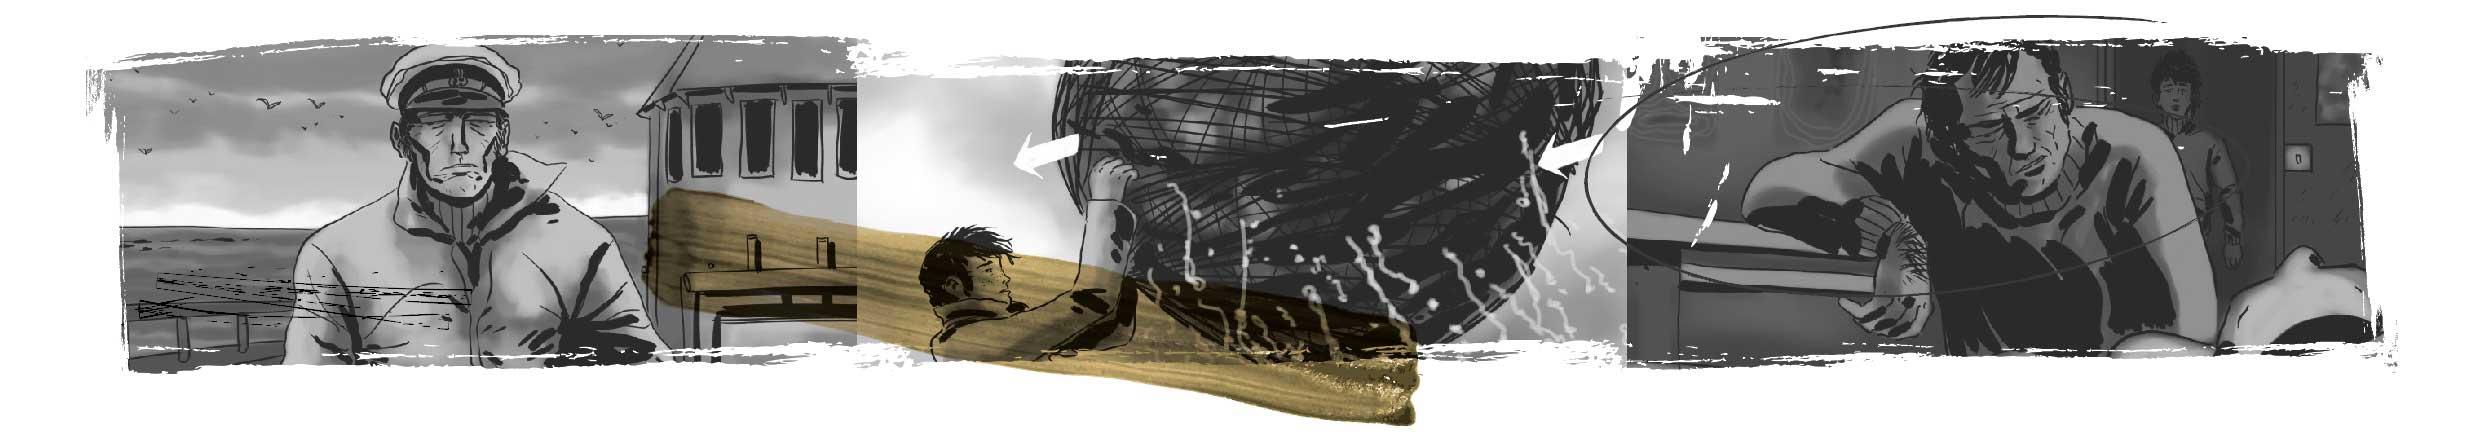 flood_storyboard.jpg